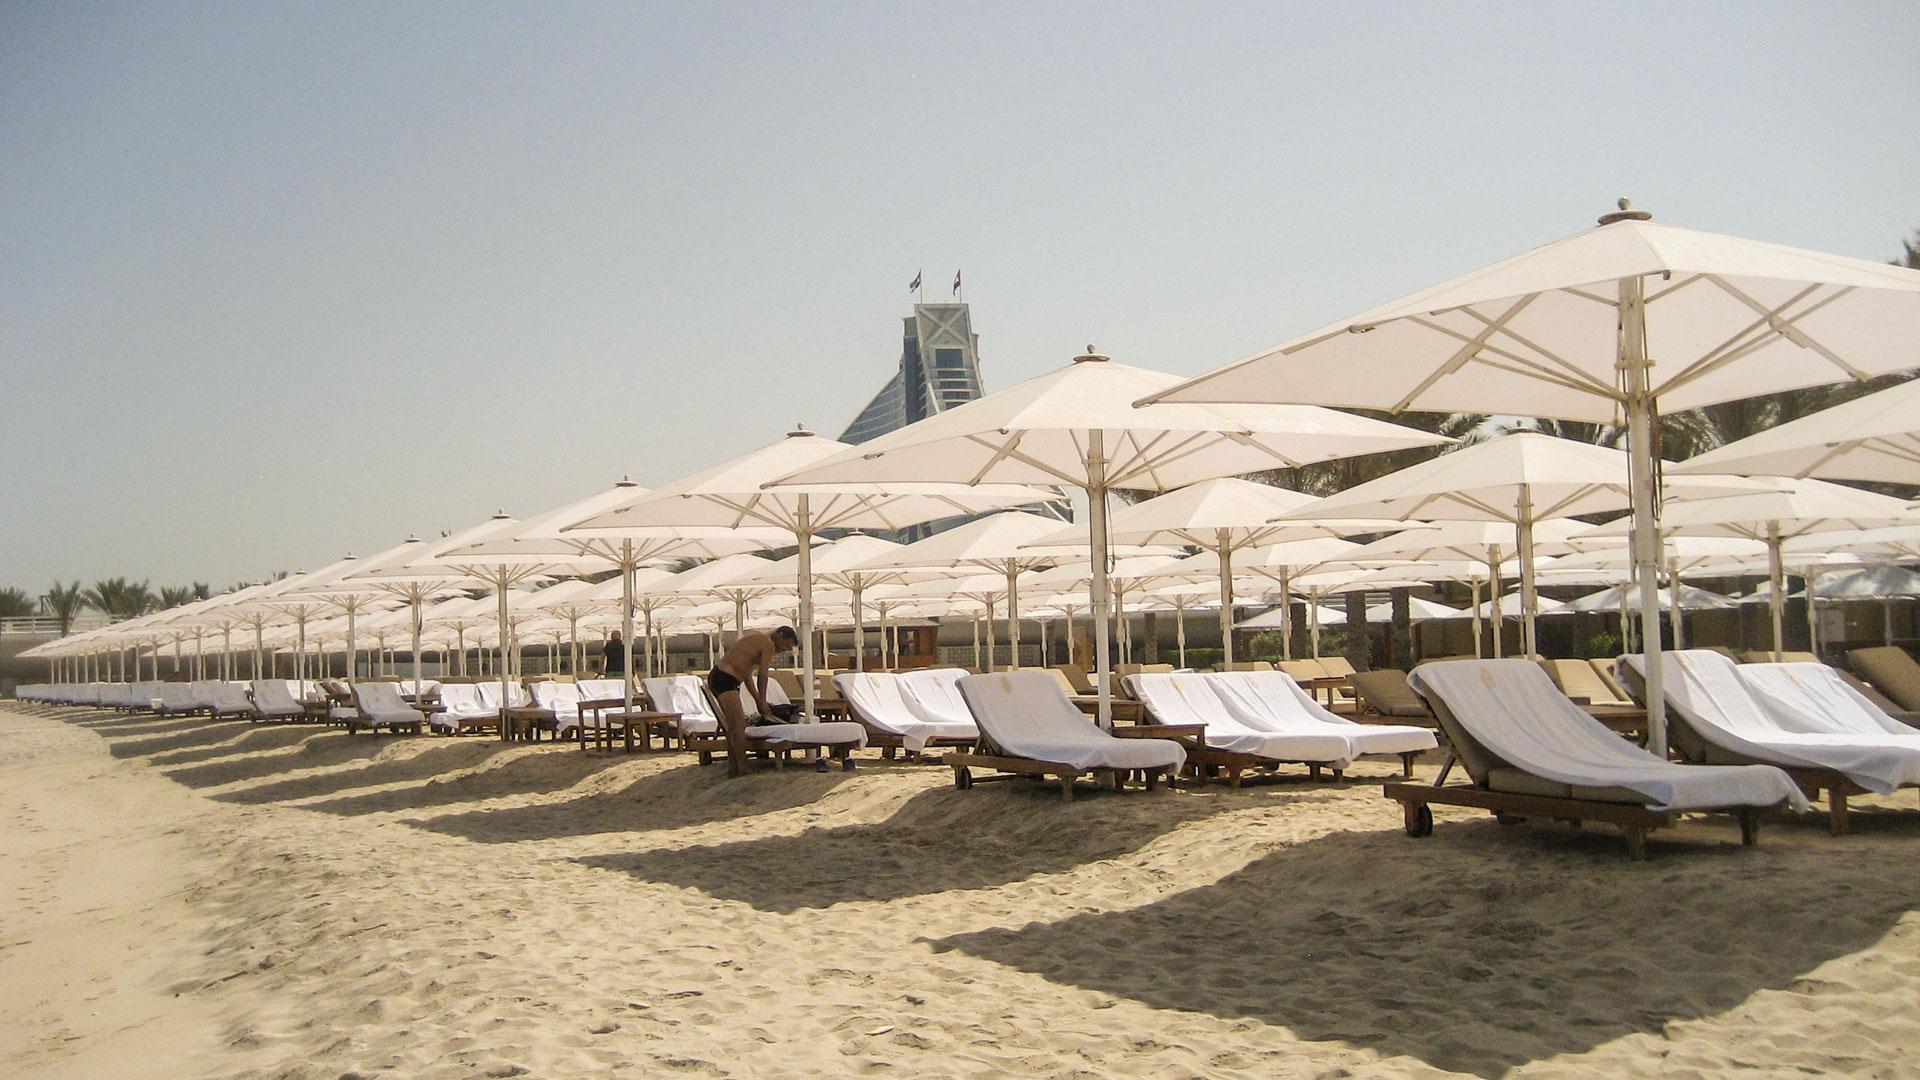 Jumbrella Sonnenschirm - Jumbrella Burj Al Arab Hotel in Dubai - Premium Sonnenschutz Lösung von Bahama